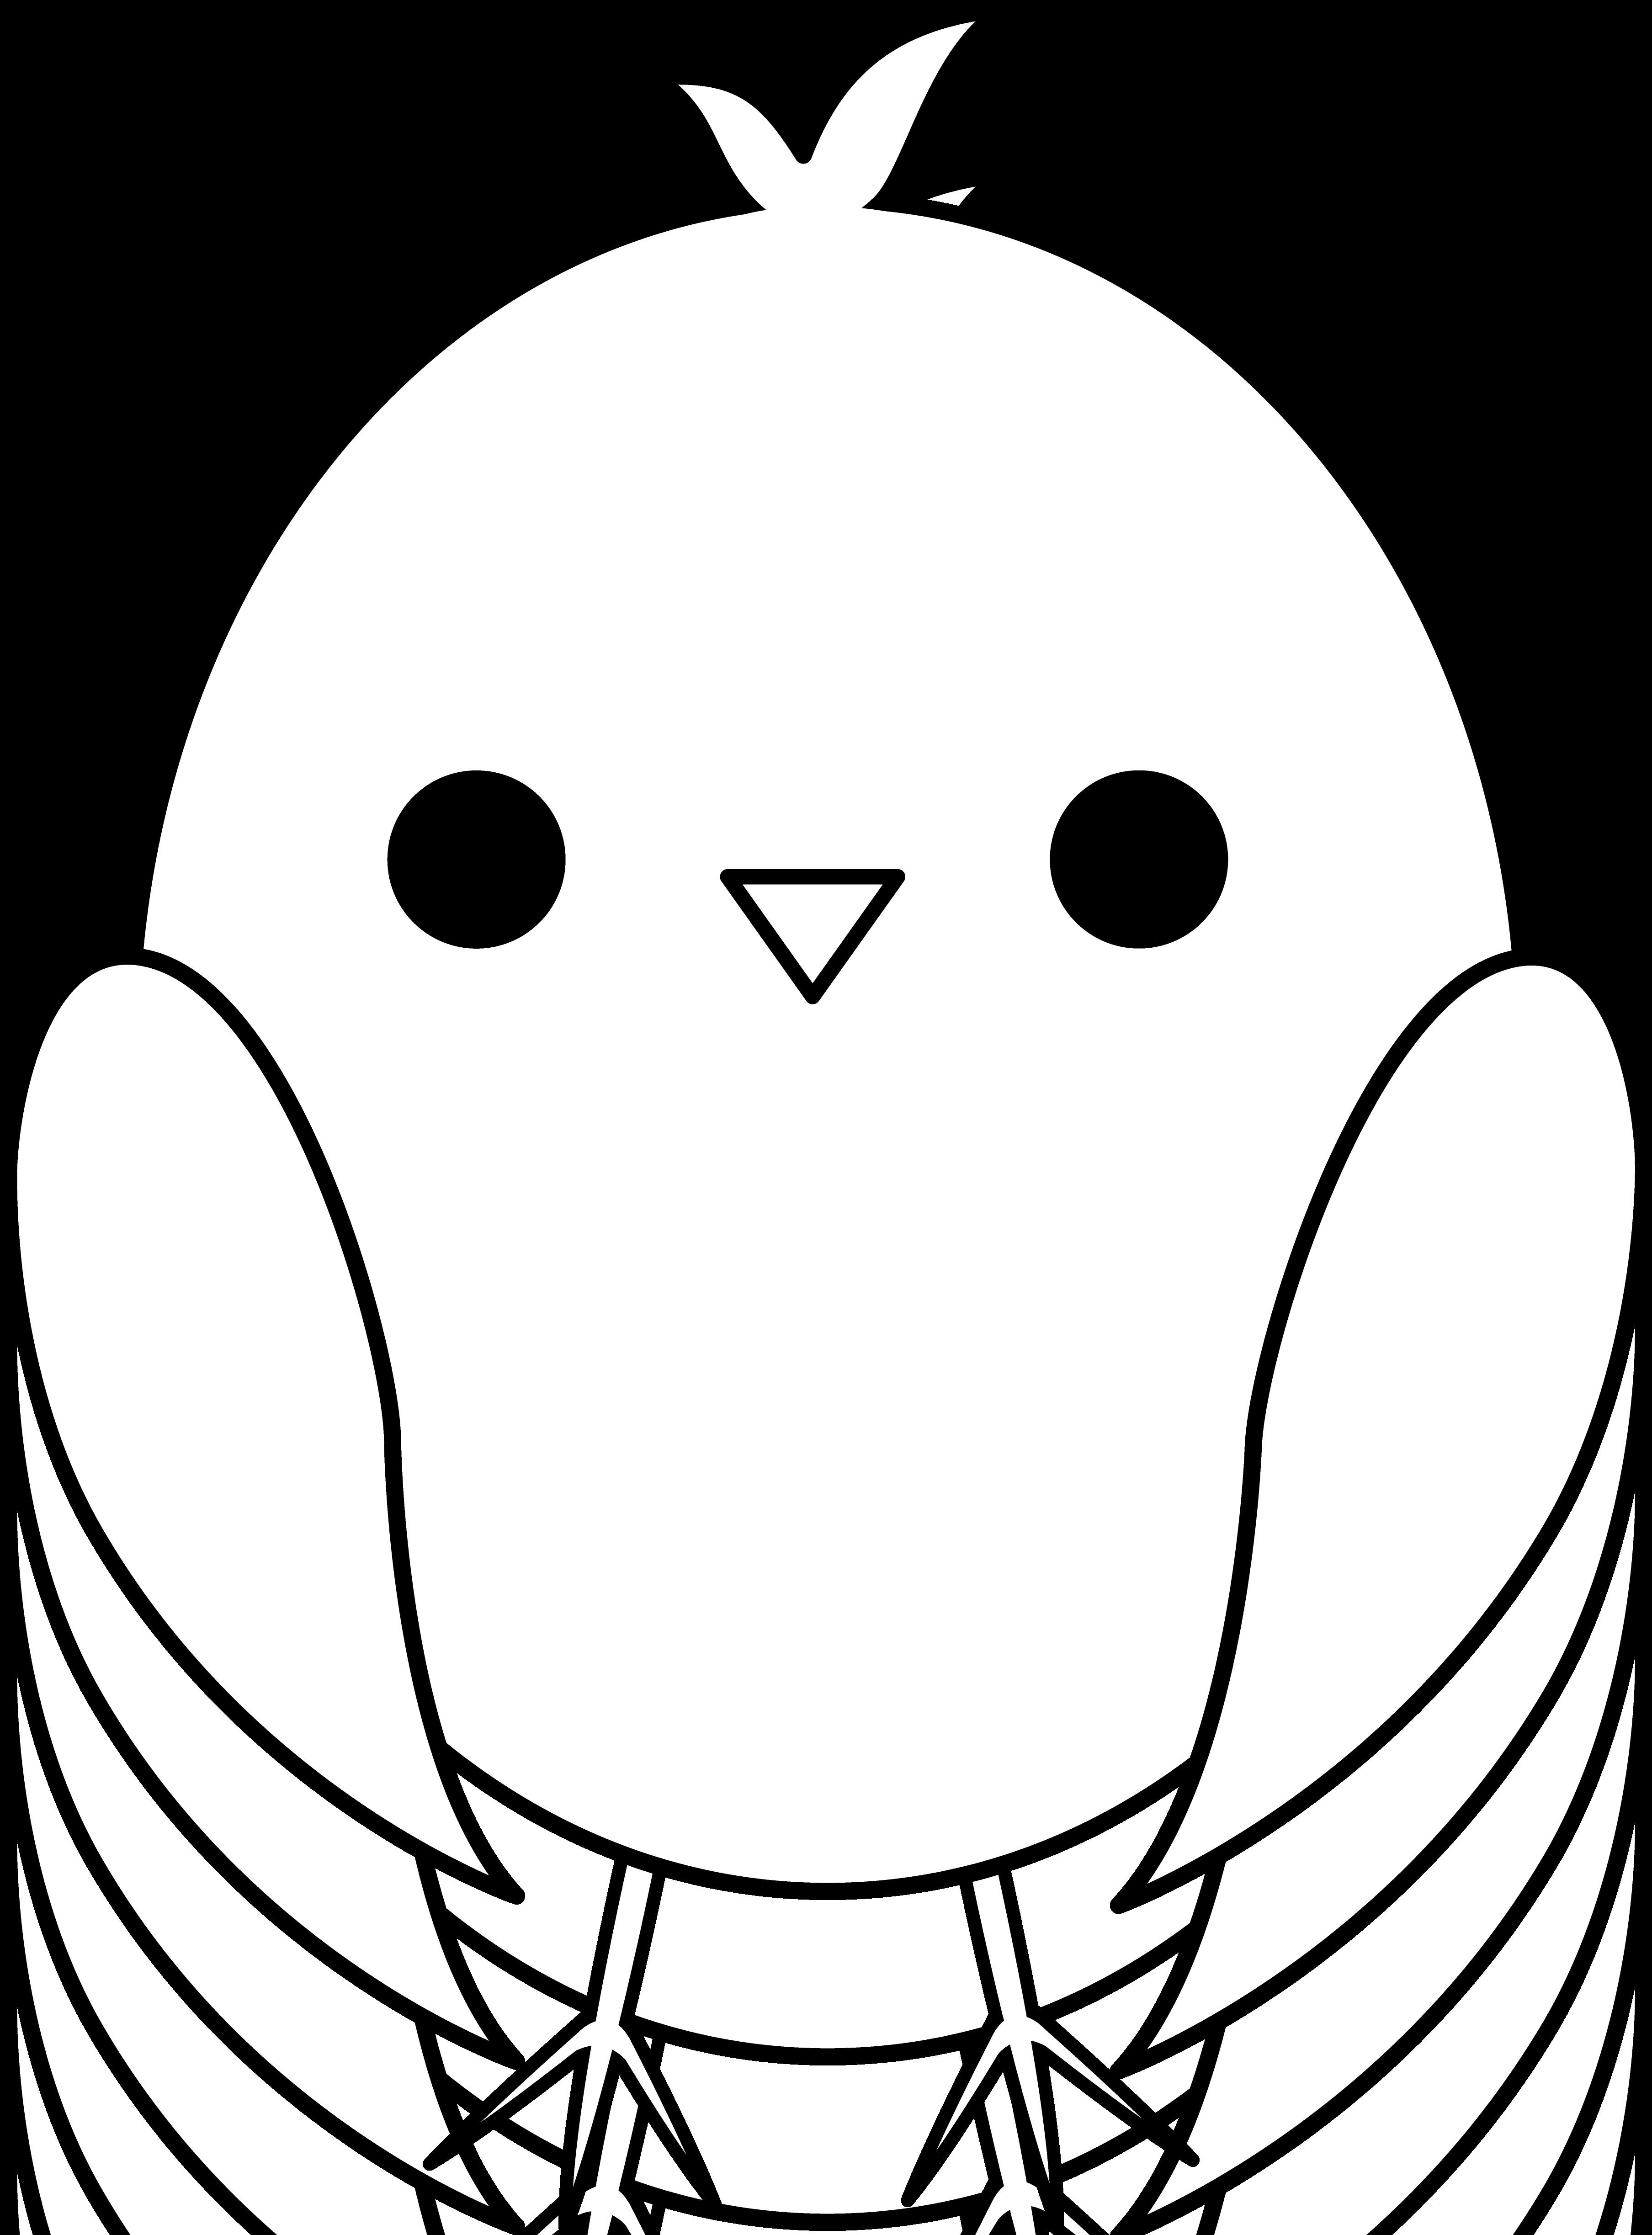 passaro | moldes | Pinterest | Pájaro, Molde y Apliques